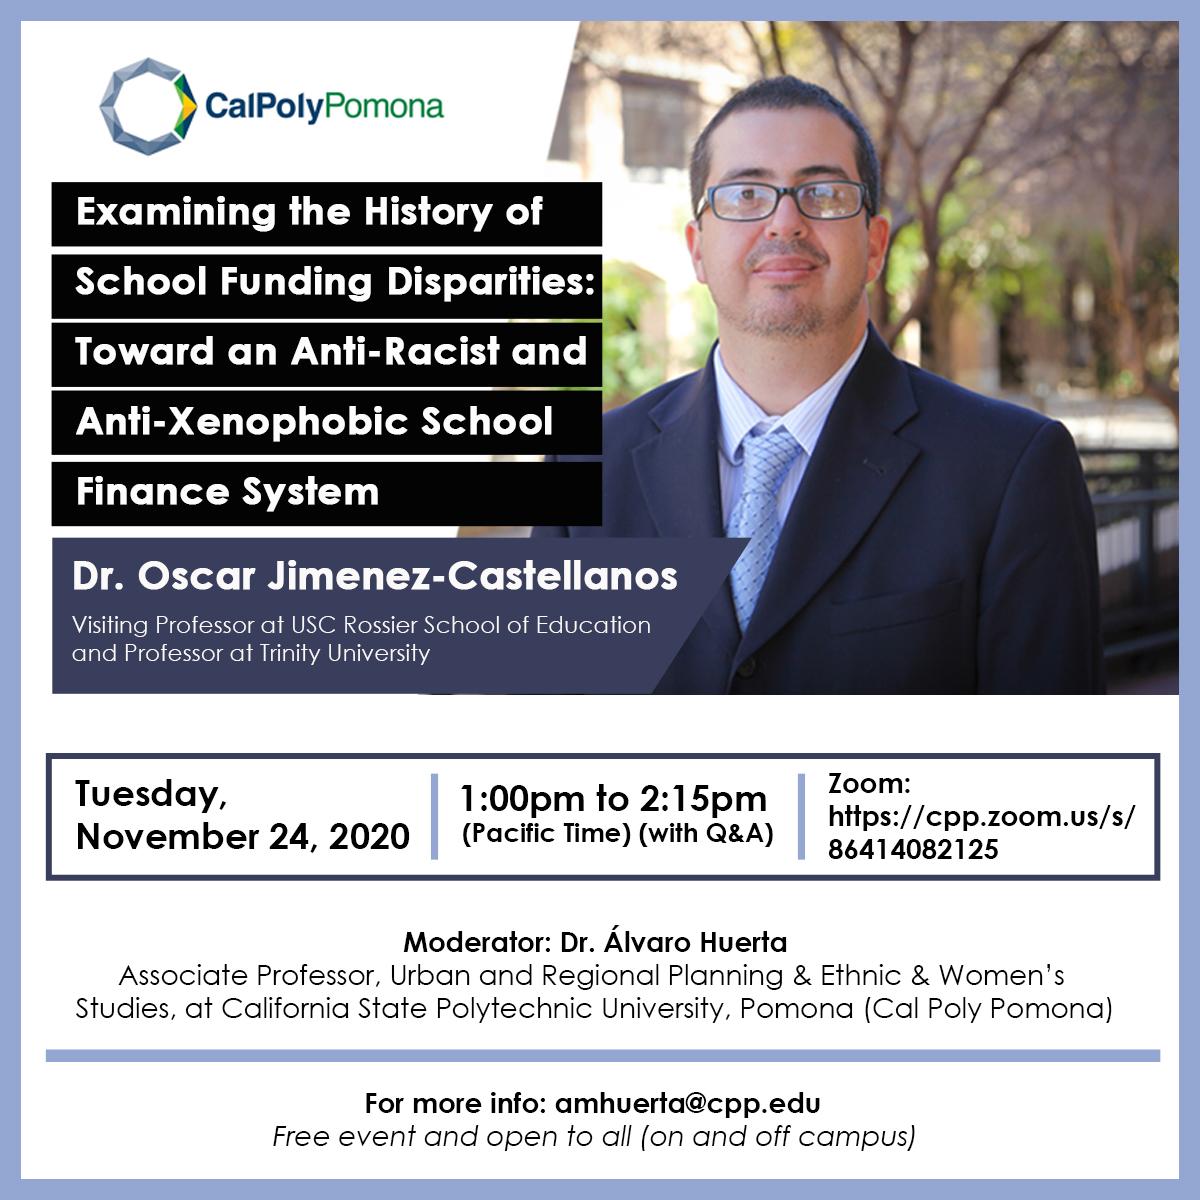 Examining the History of School Funding Disparities: Toward an Anti-Racist and Anti-Xenophobic School Finance System